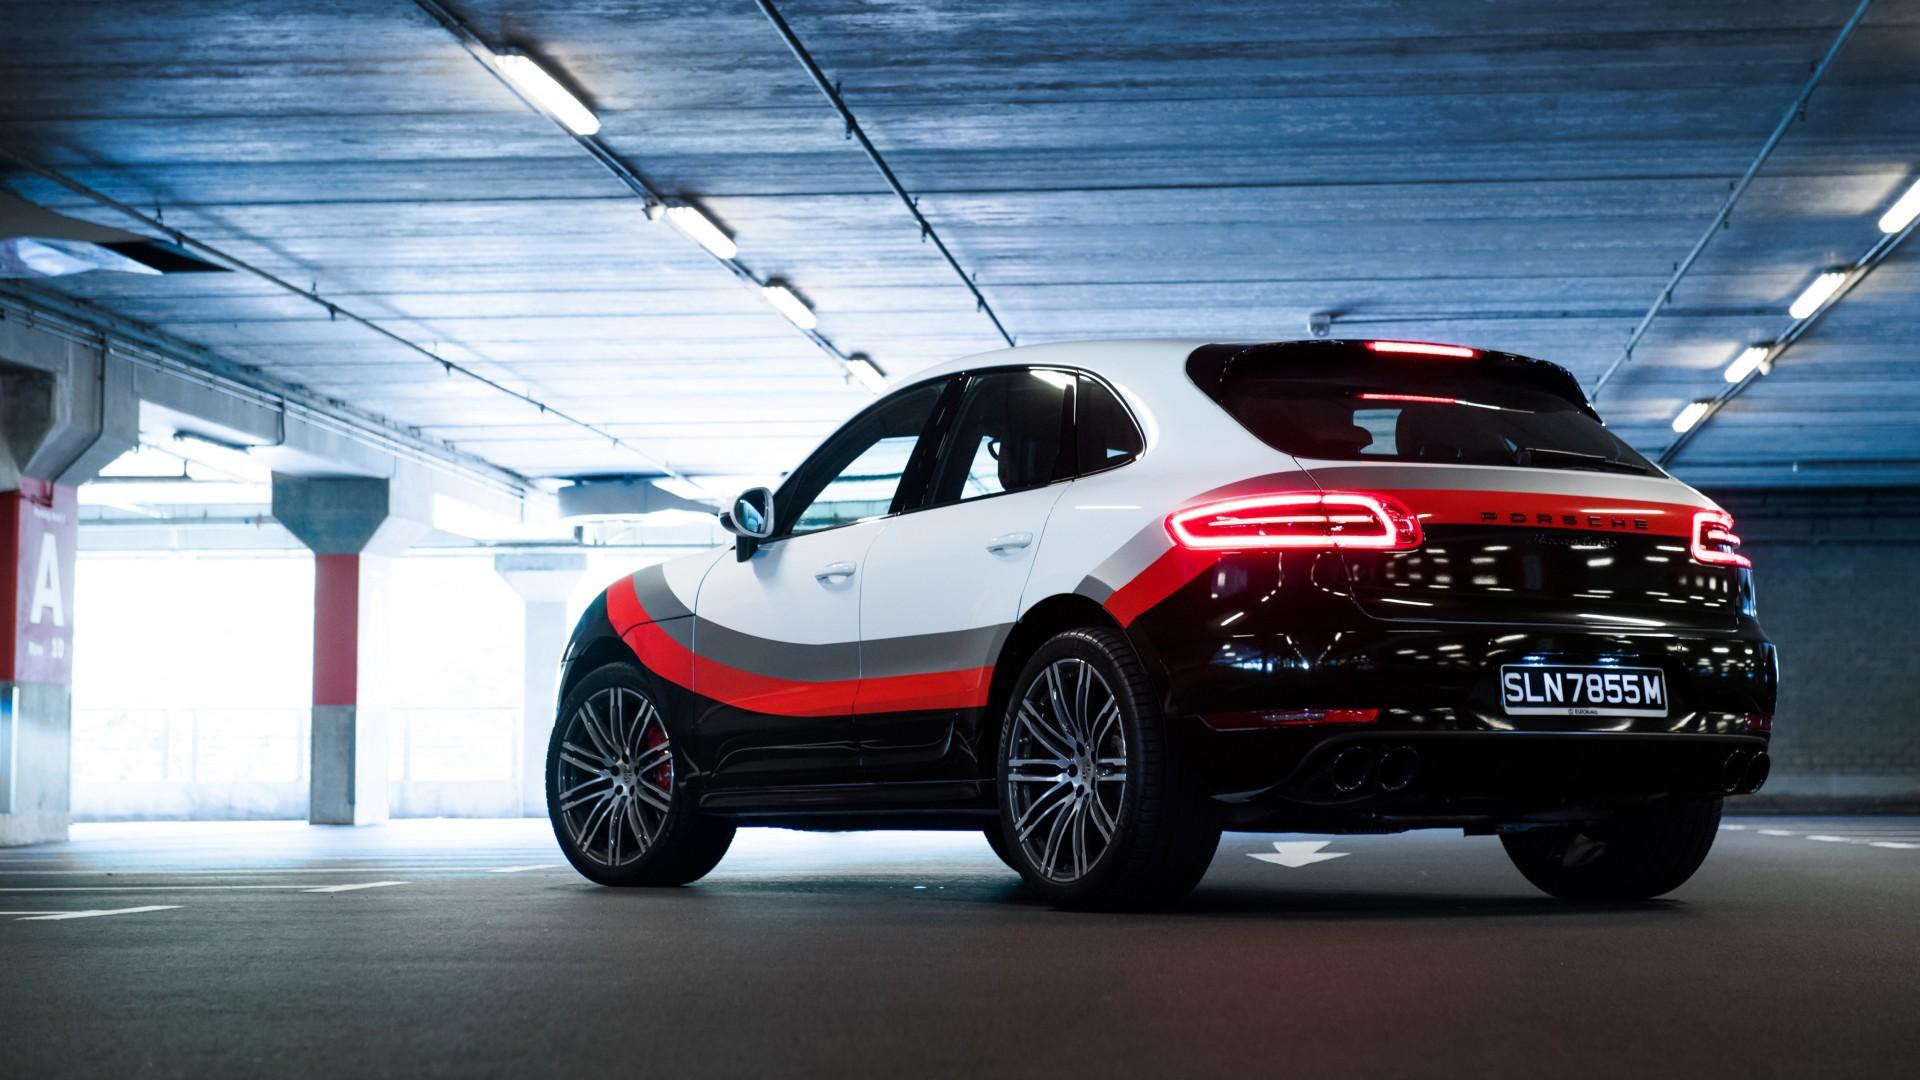 2017 Porsche Macan Turbo Performance Package 2 Wallpaper